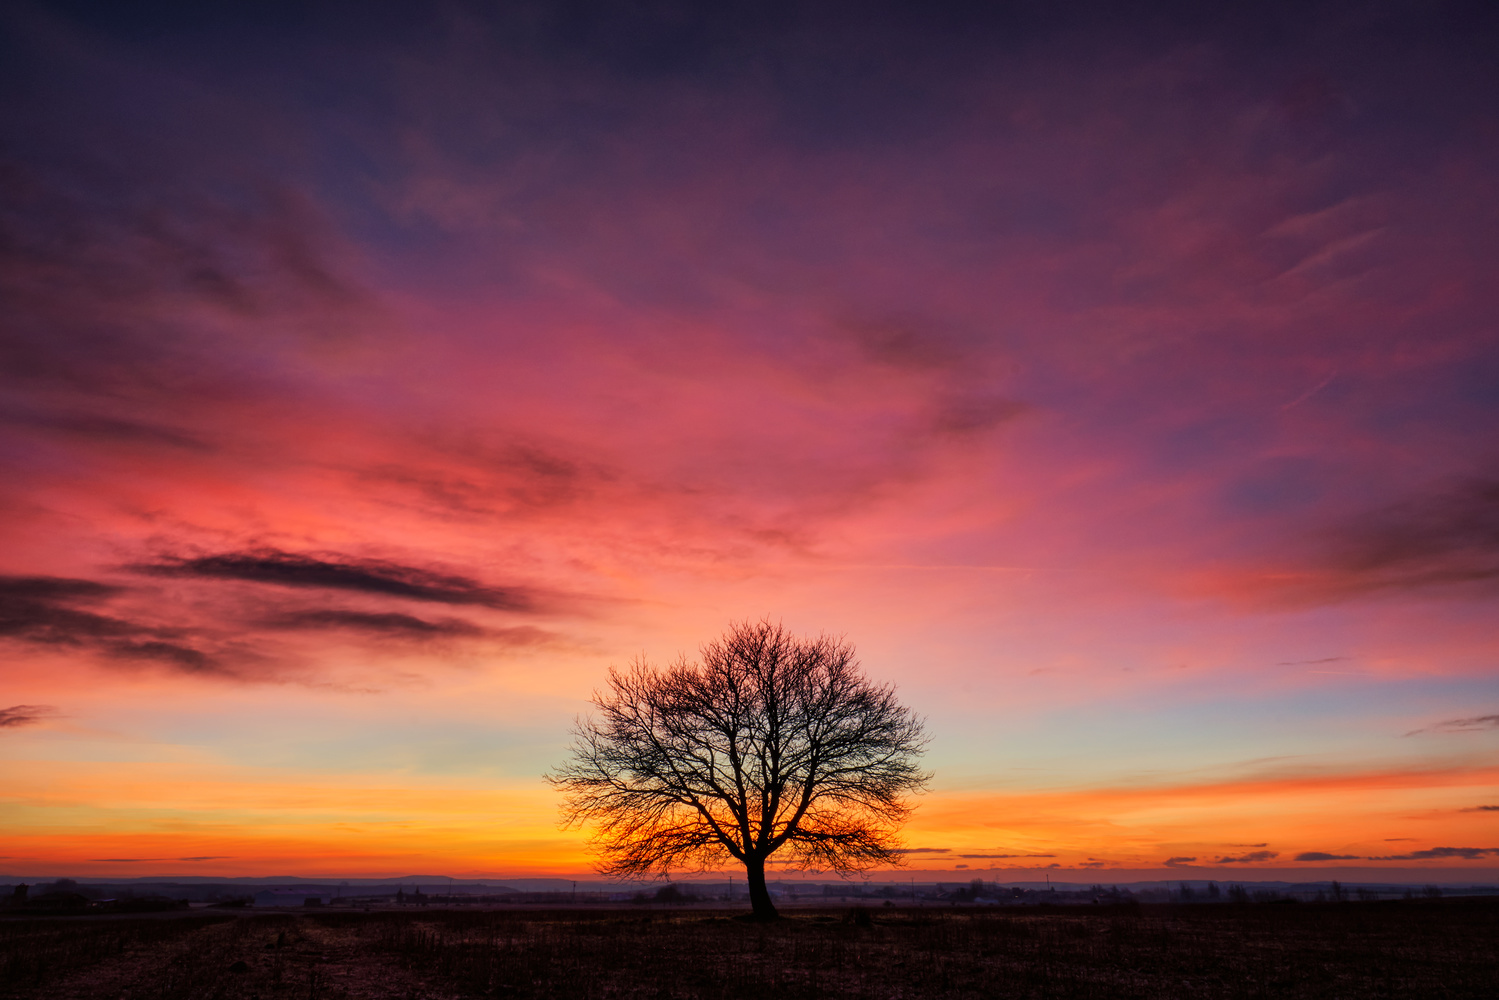 Tree at dawn by Ignacio Municio